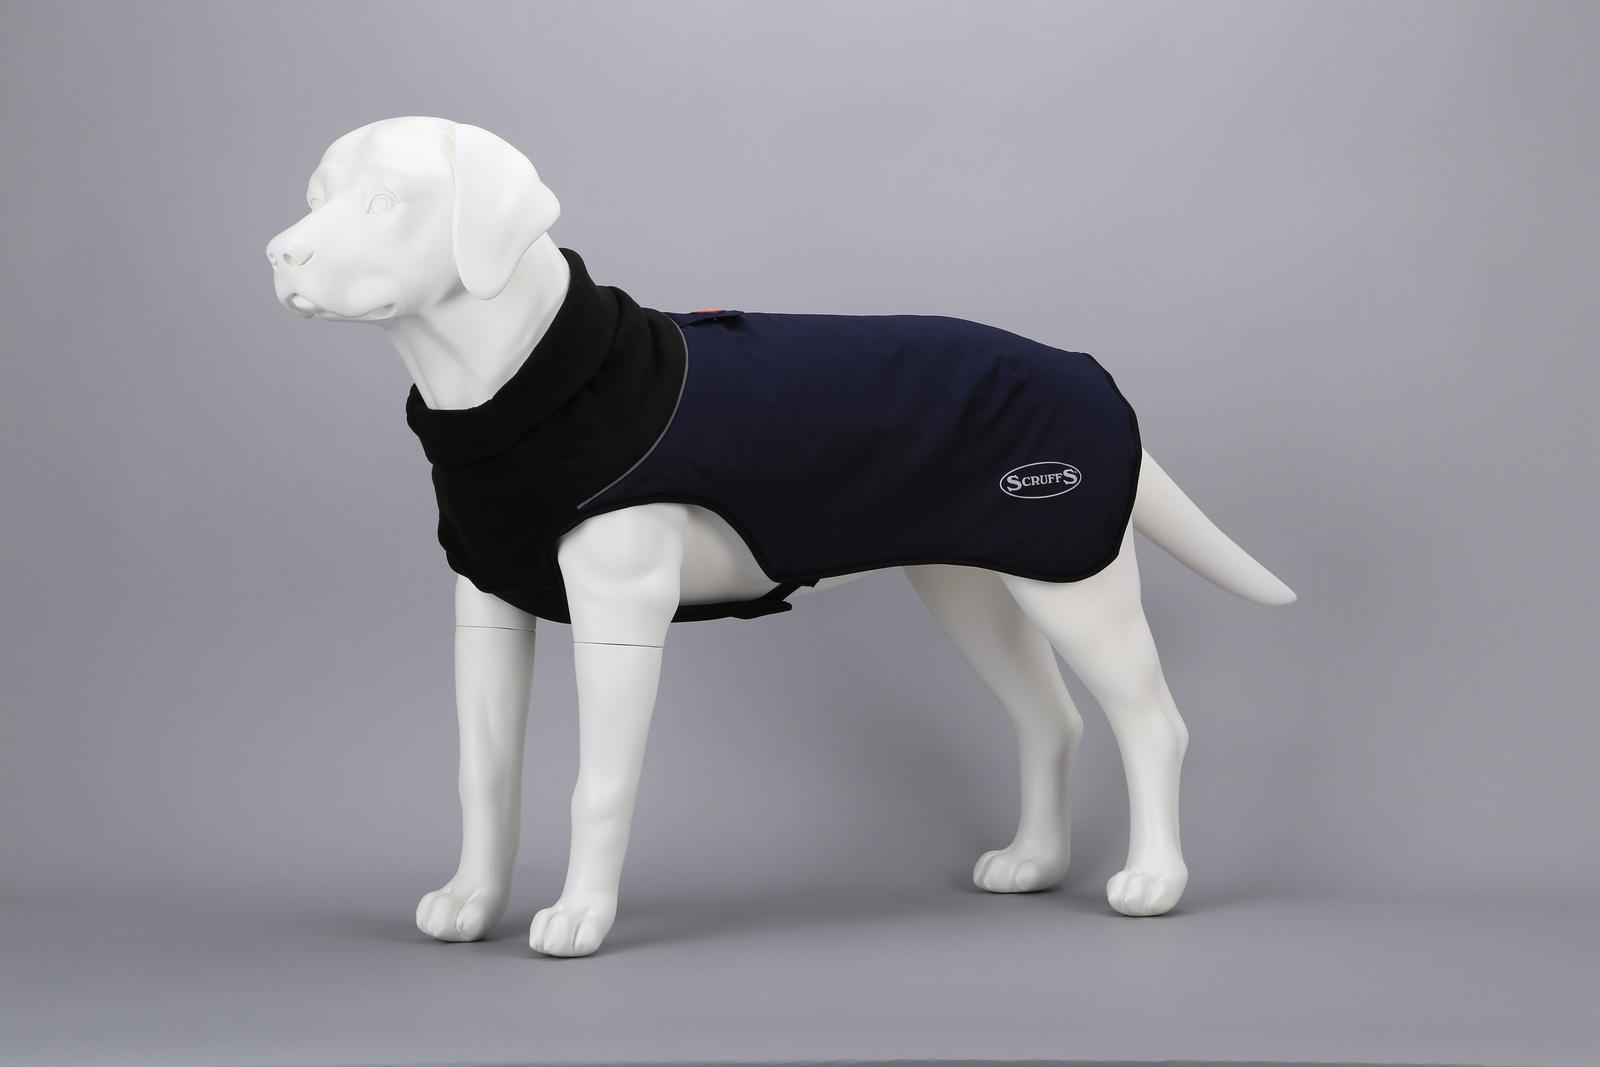 Одежда для собак SCRUFFS Thermal попона согревающая 936136, 60см, темно-синий